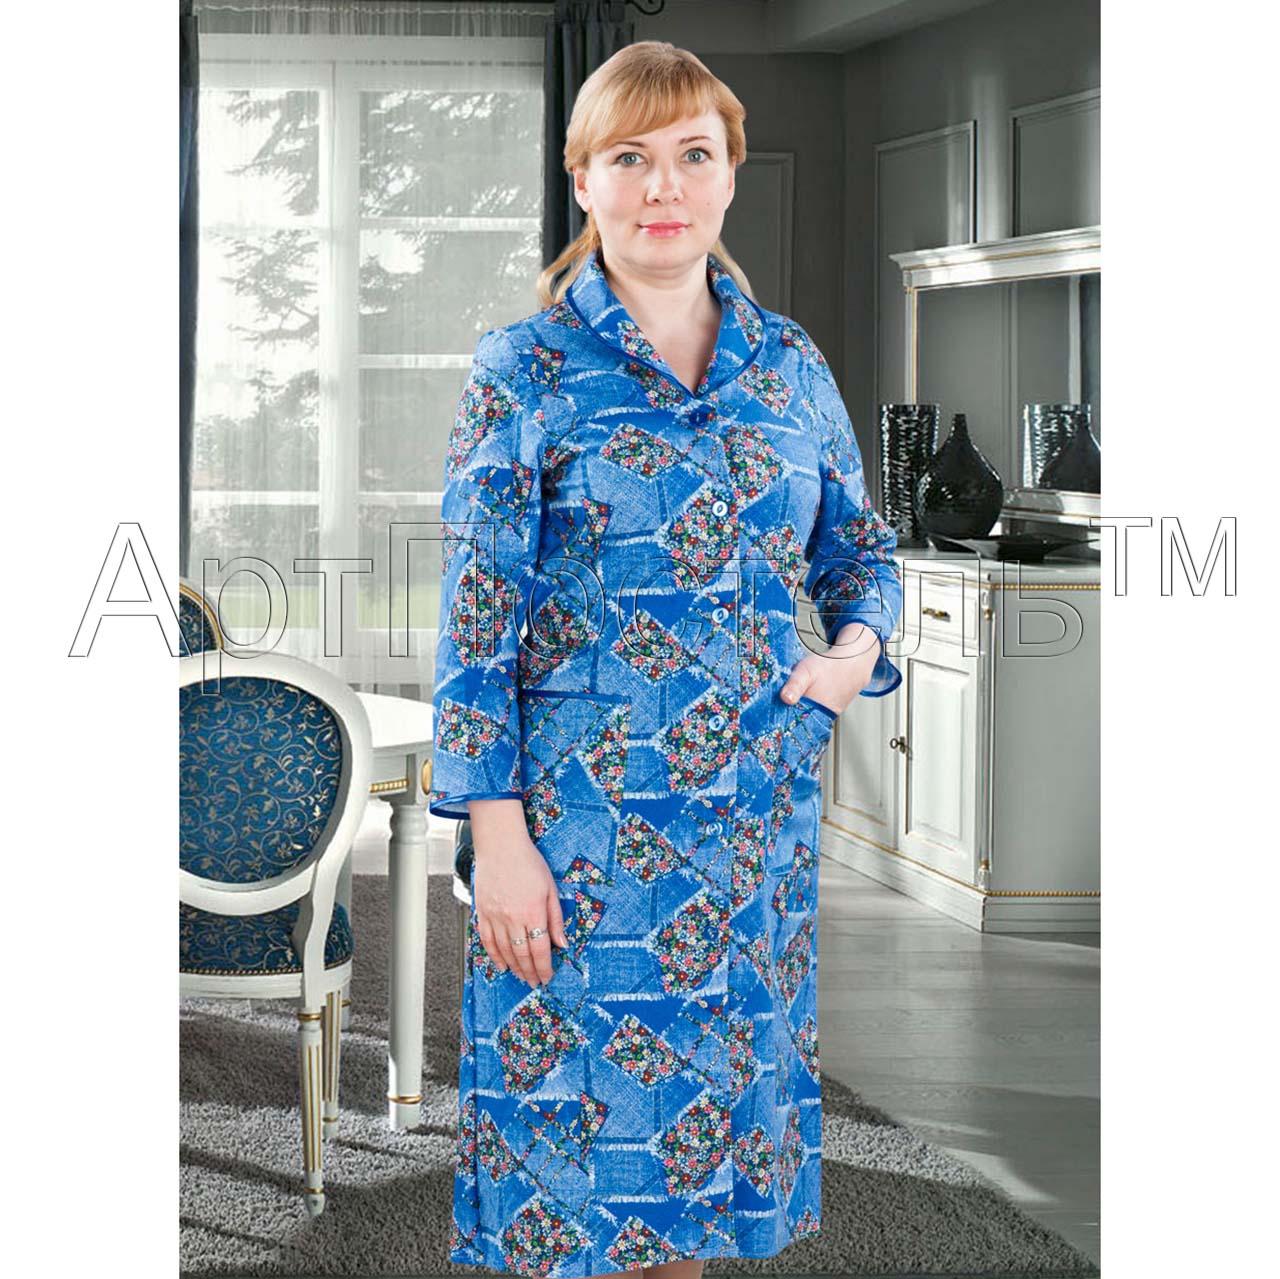 Жен. халат Американка на пуговицах р. 60Халаты<br>Обхват груди:120 см<br>Обхват талии:105 см<br>Обхват бедер:128 см<br>Рост:164-170 см<br><br>Тип: Жен. халат<br>Размер: 60<br>Материал: Фланель